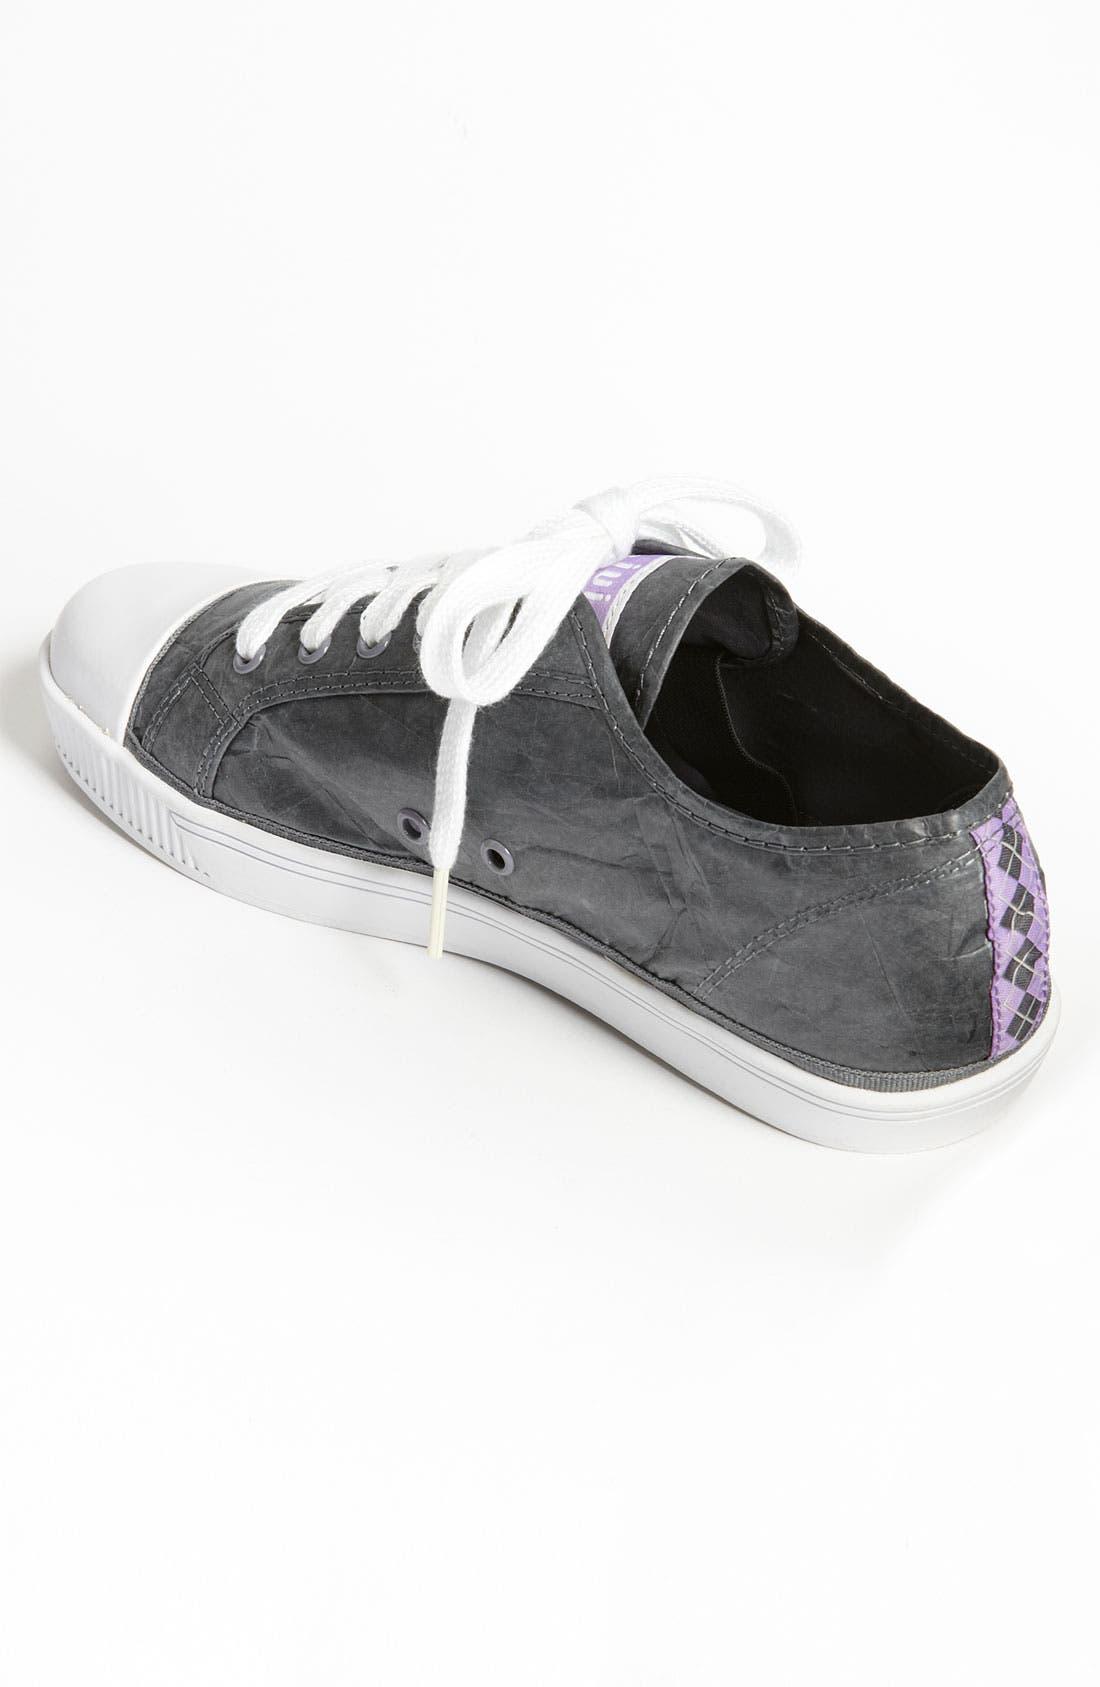 Alternate Image 2  - Civic Duty 'Fascination' Sneaker (Men)